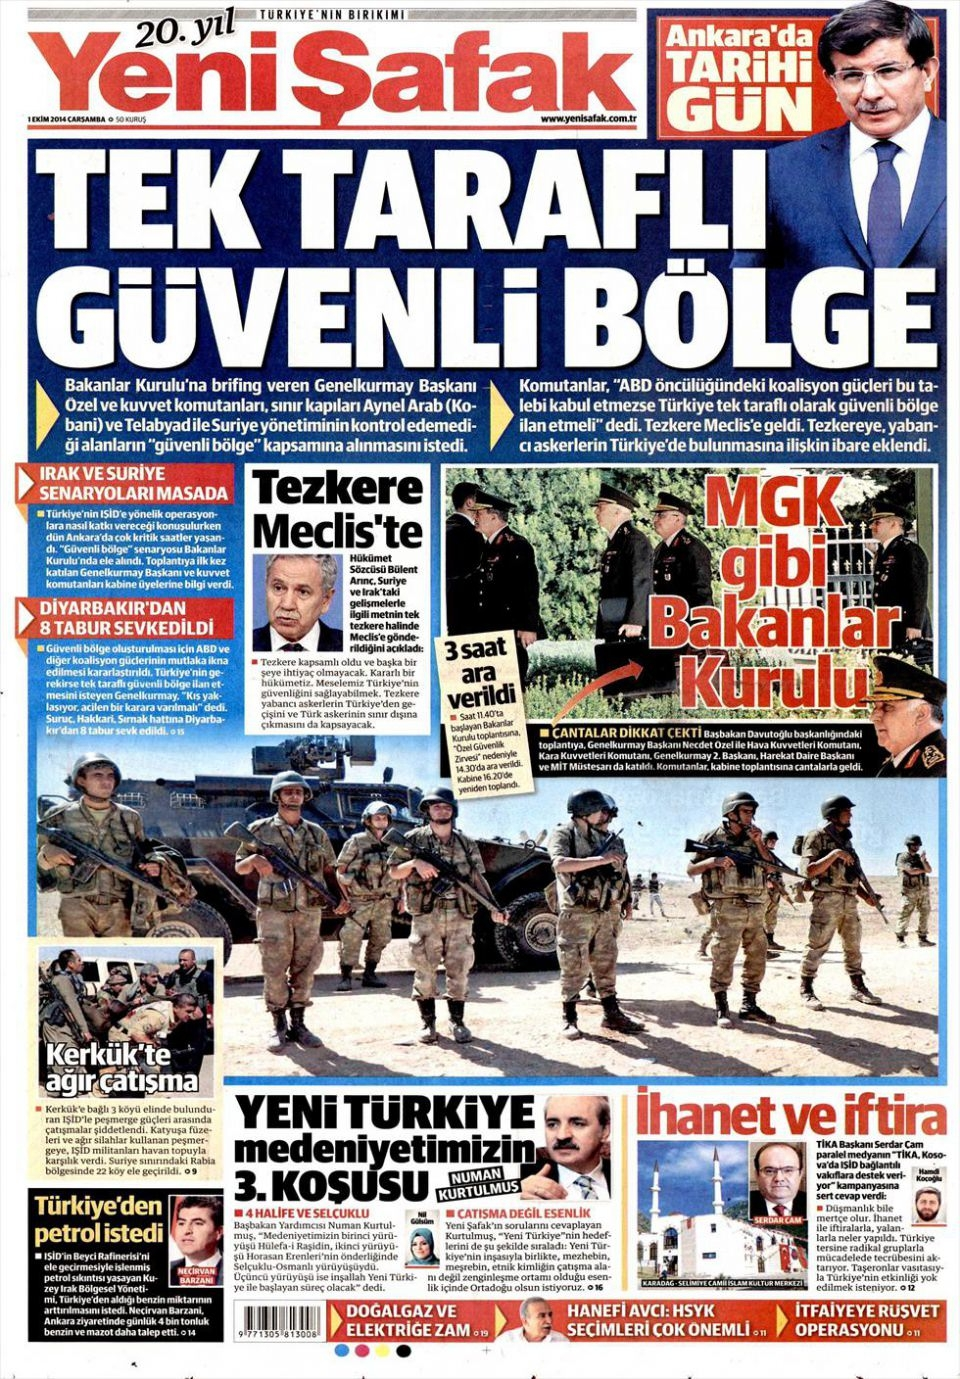 1 Ekim 2014 gazete manşetleri 24